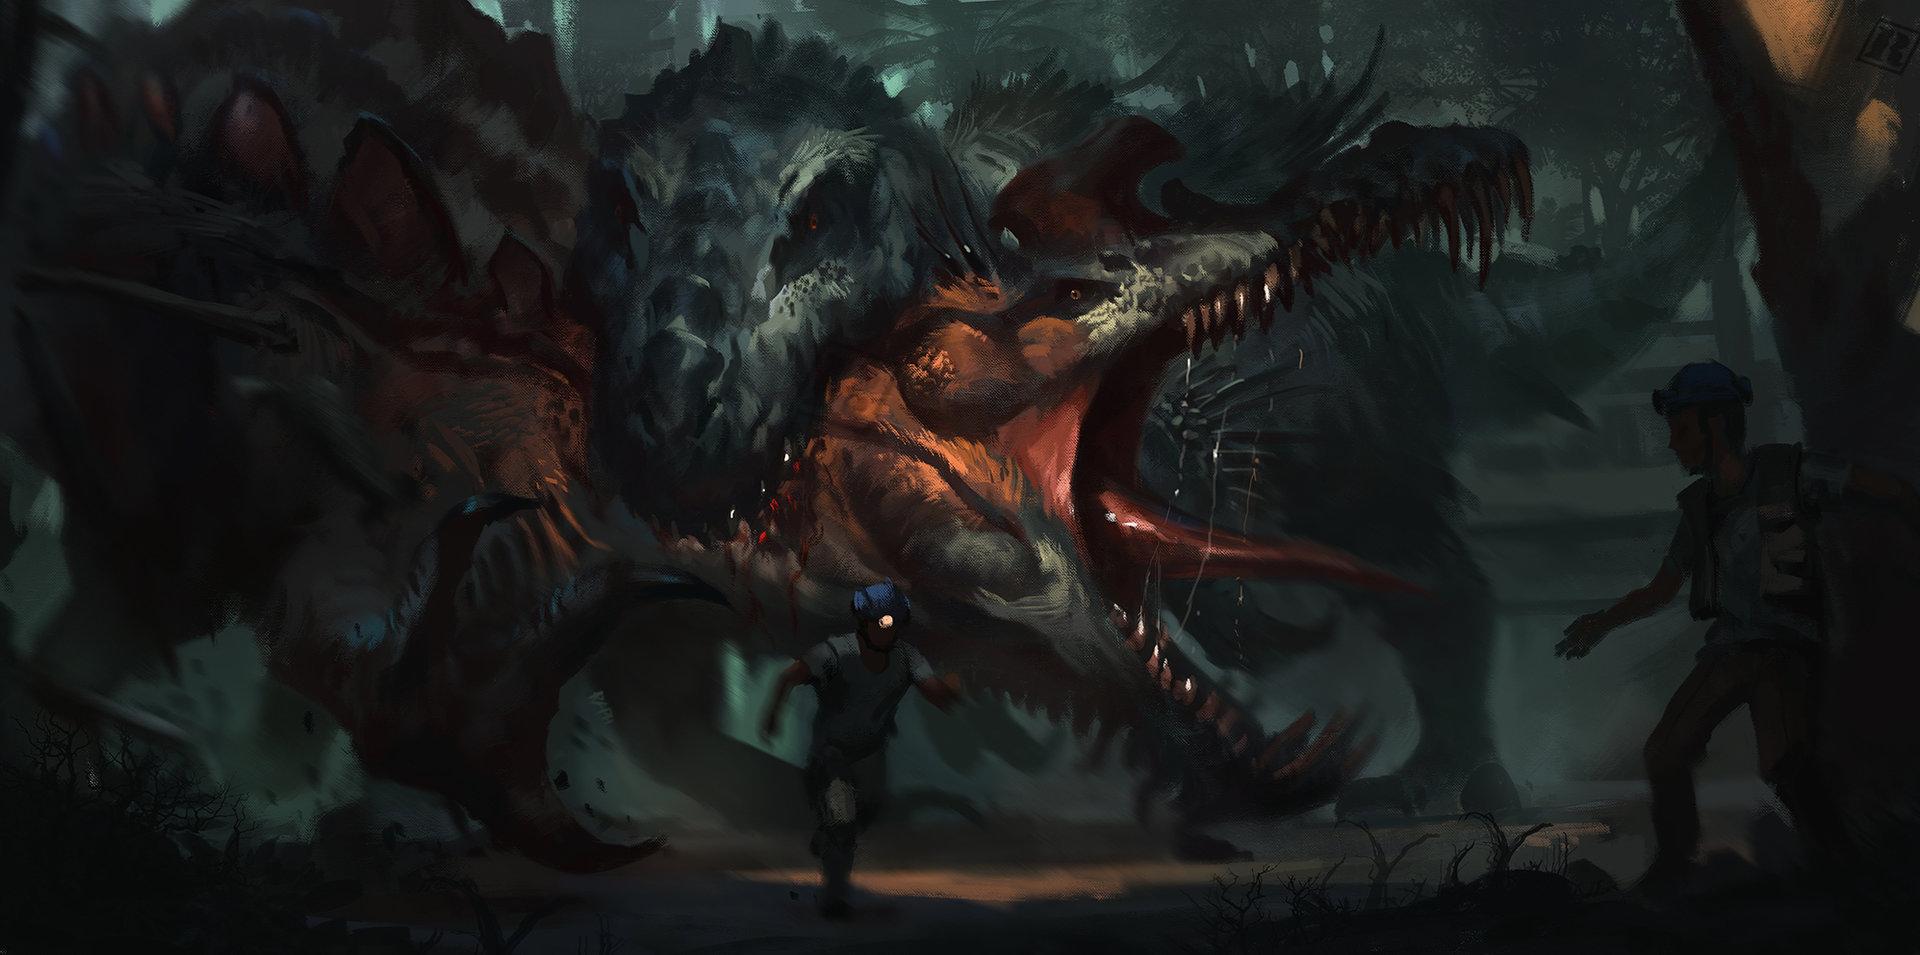 Therospinax vs Belial  https://www.artstation.com/artwork/dino-hybrid-belial